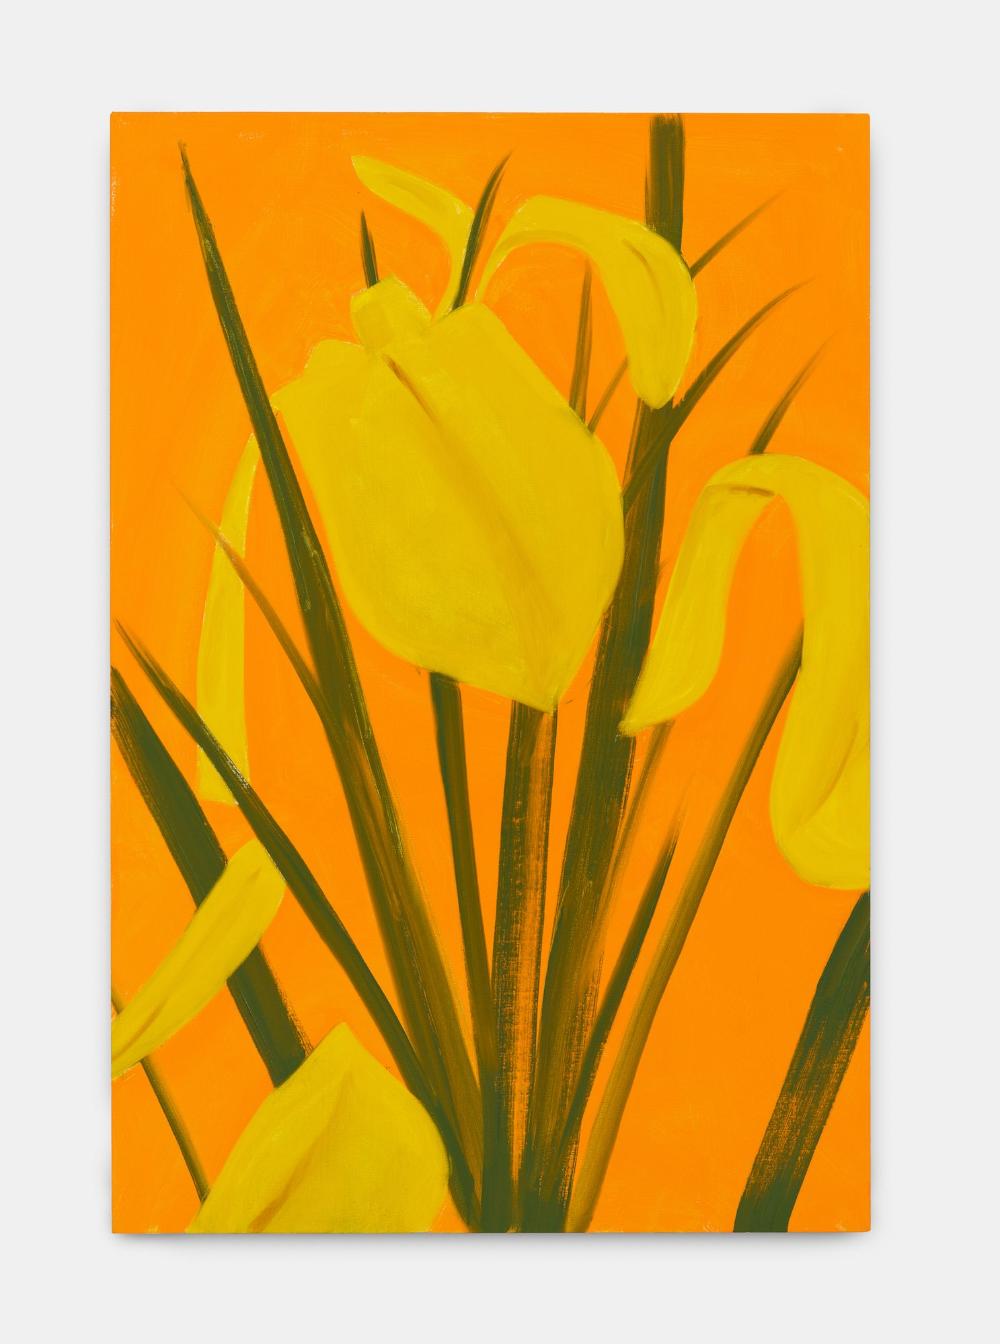 Alex Katz Yellow Flags | FRANK FLUEGEL GALERIE